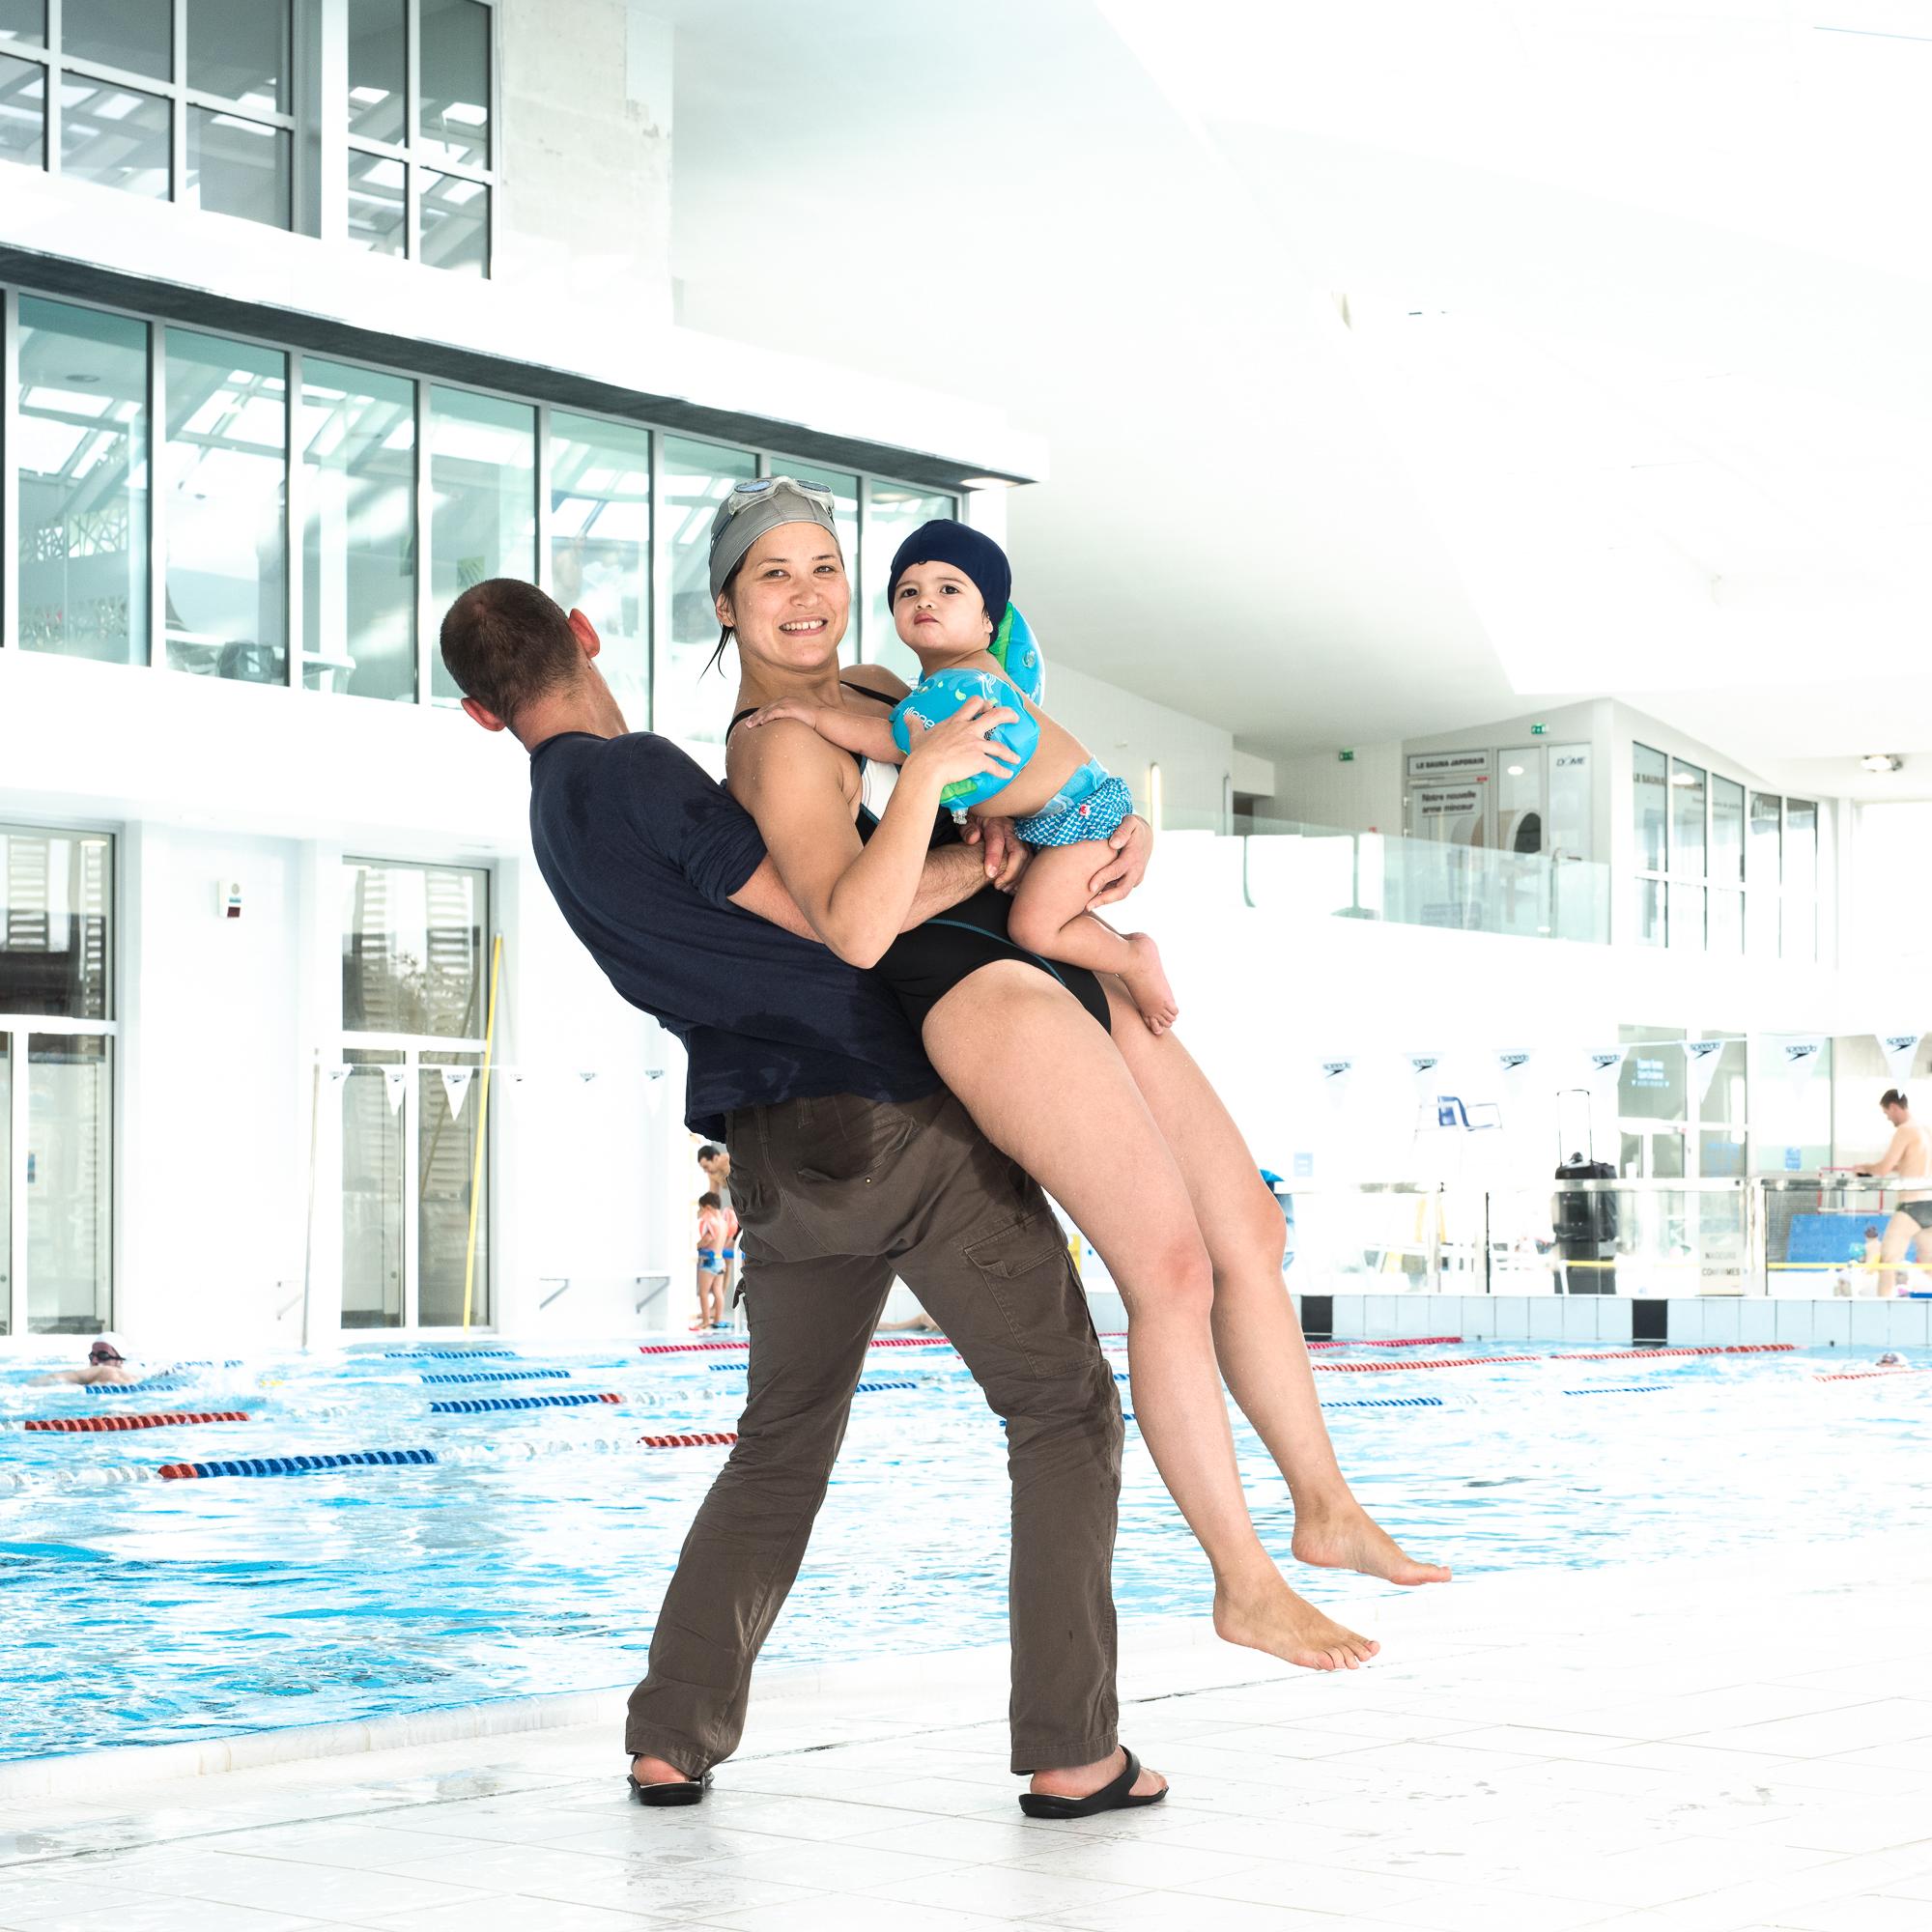 Piscine - Bébé nageur bleu